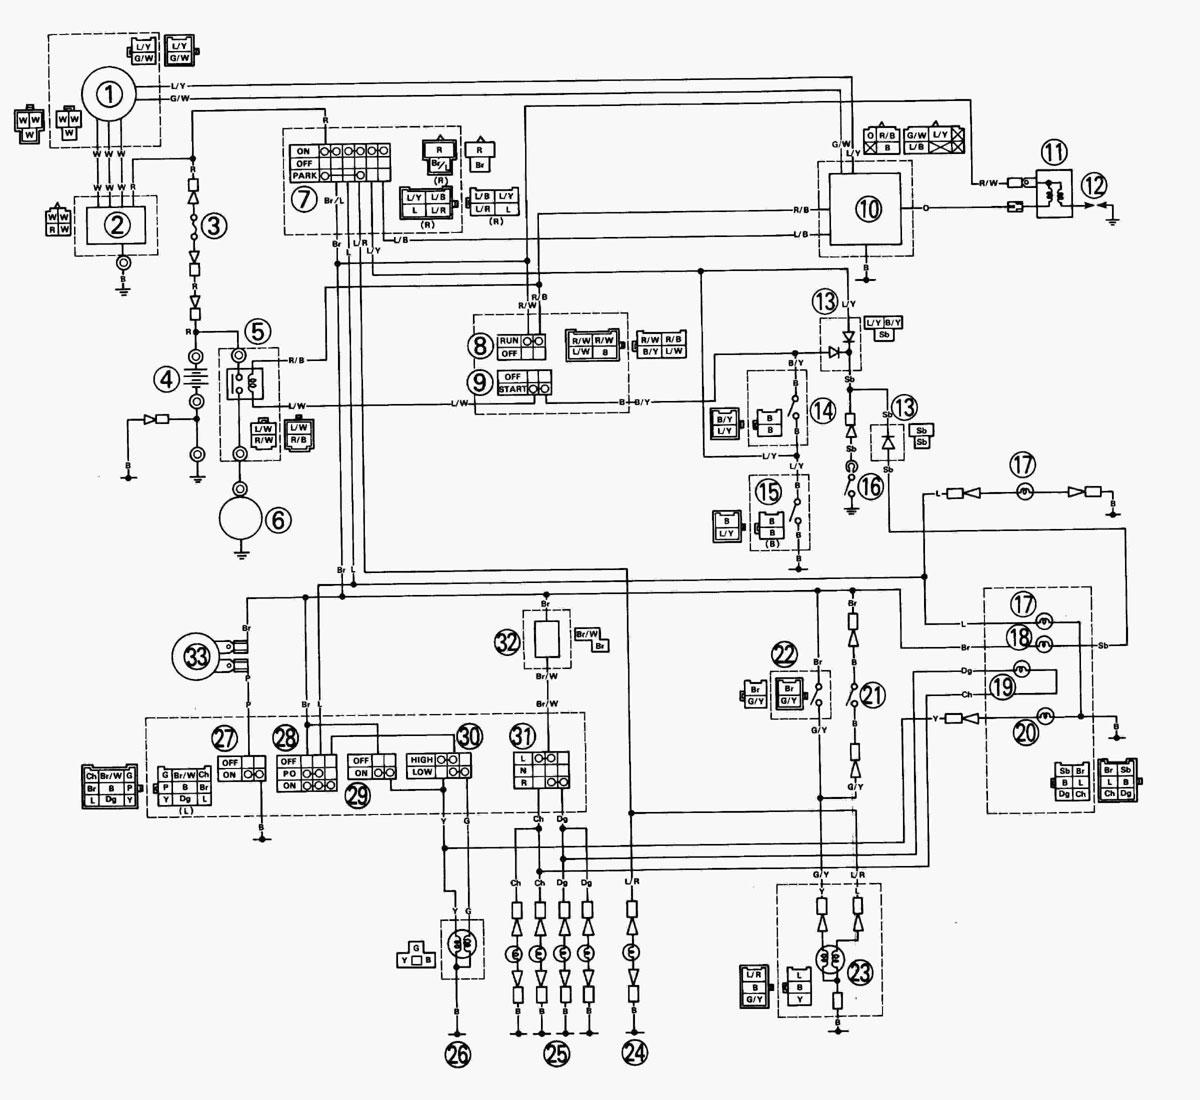 Diagram  Yamaha Xt 200 Wiring Diagram Full Version Hd Quality Wiring Diagram